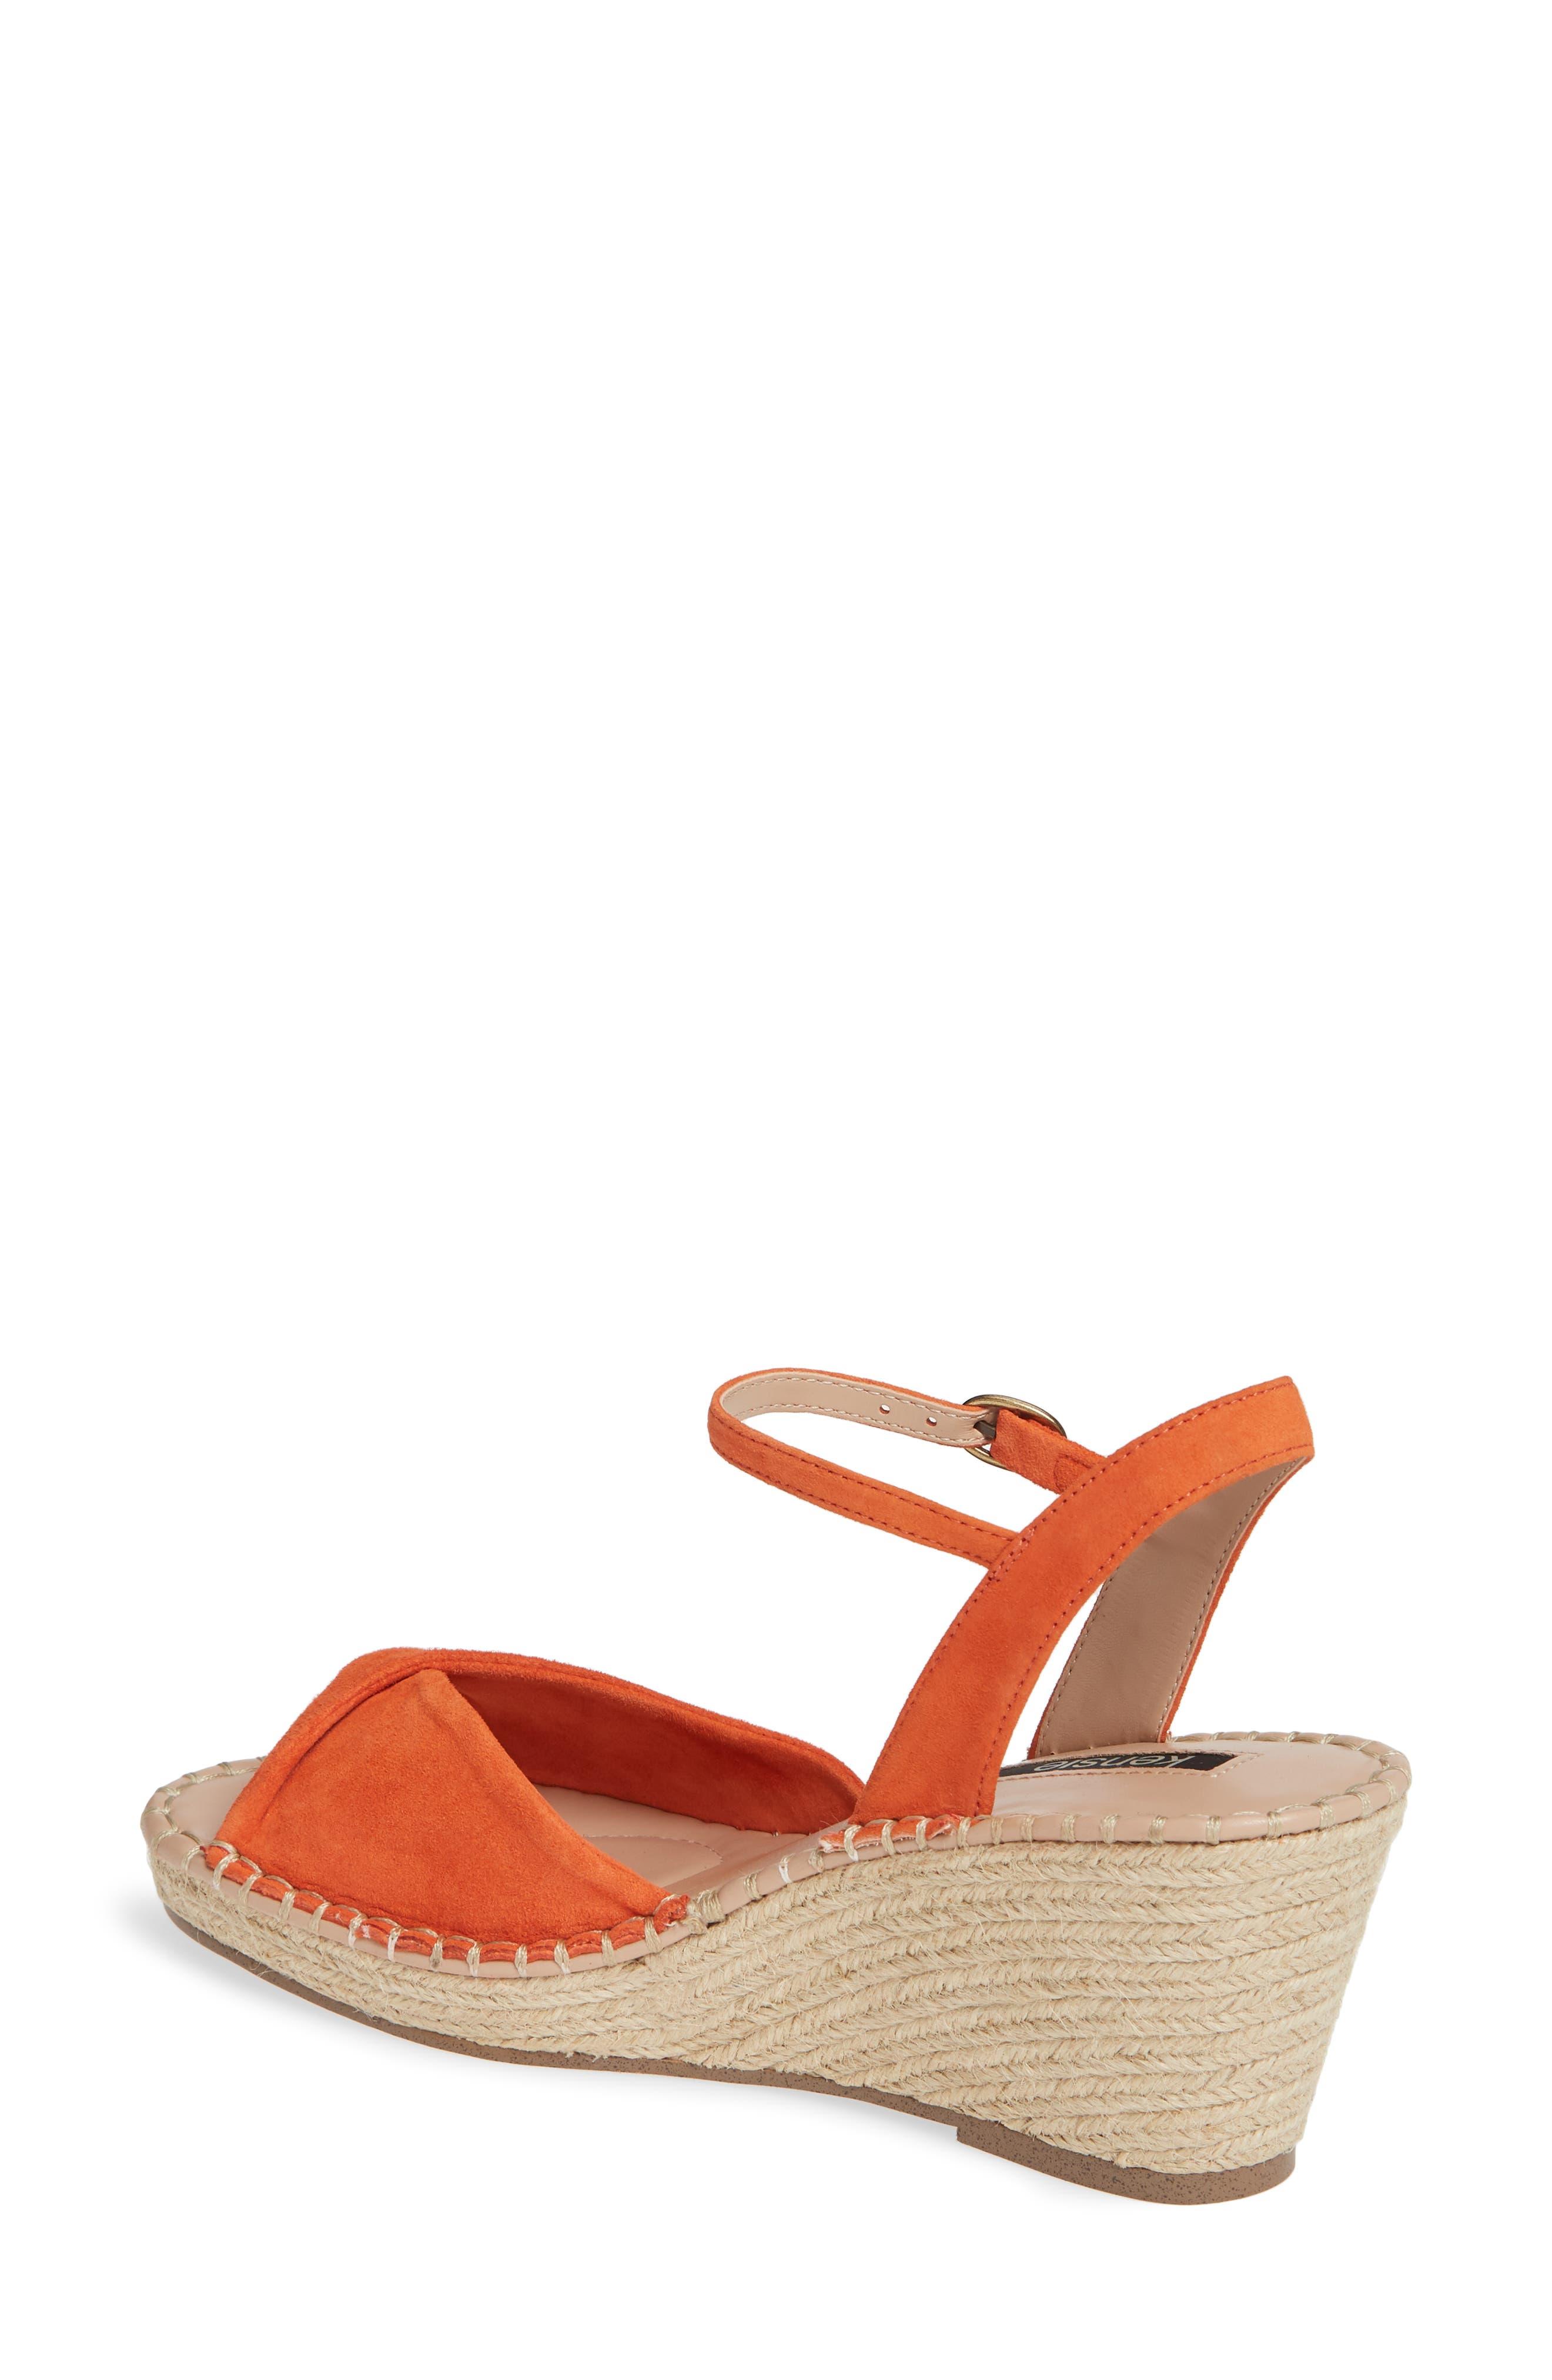 0ef00a64705b Women s Shoes New Arrivals  Boots